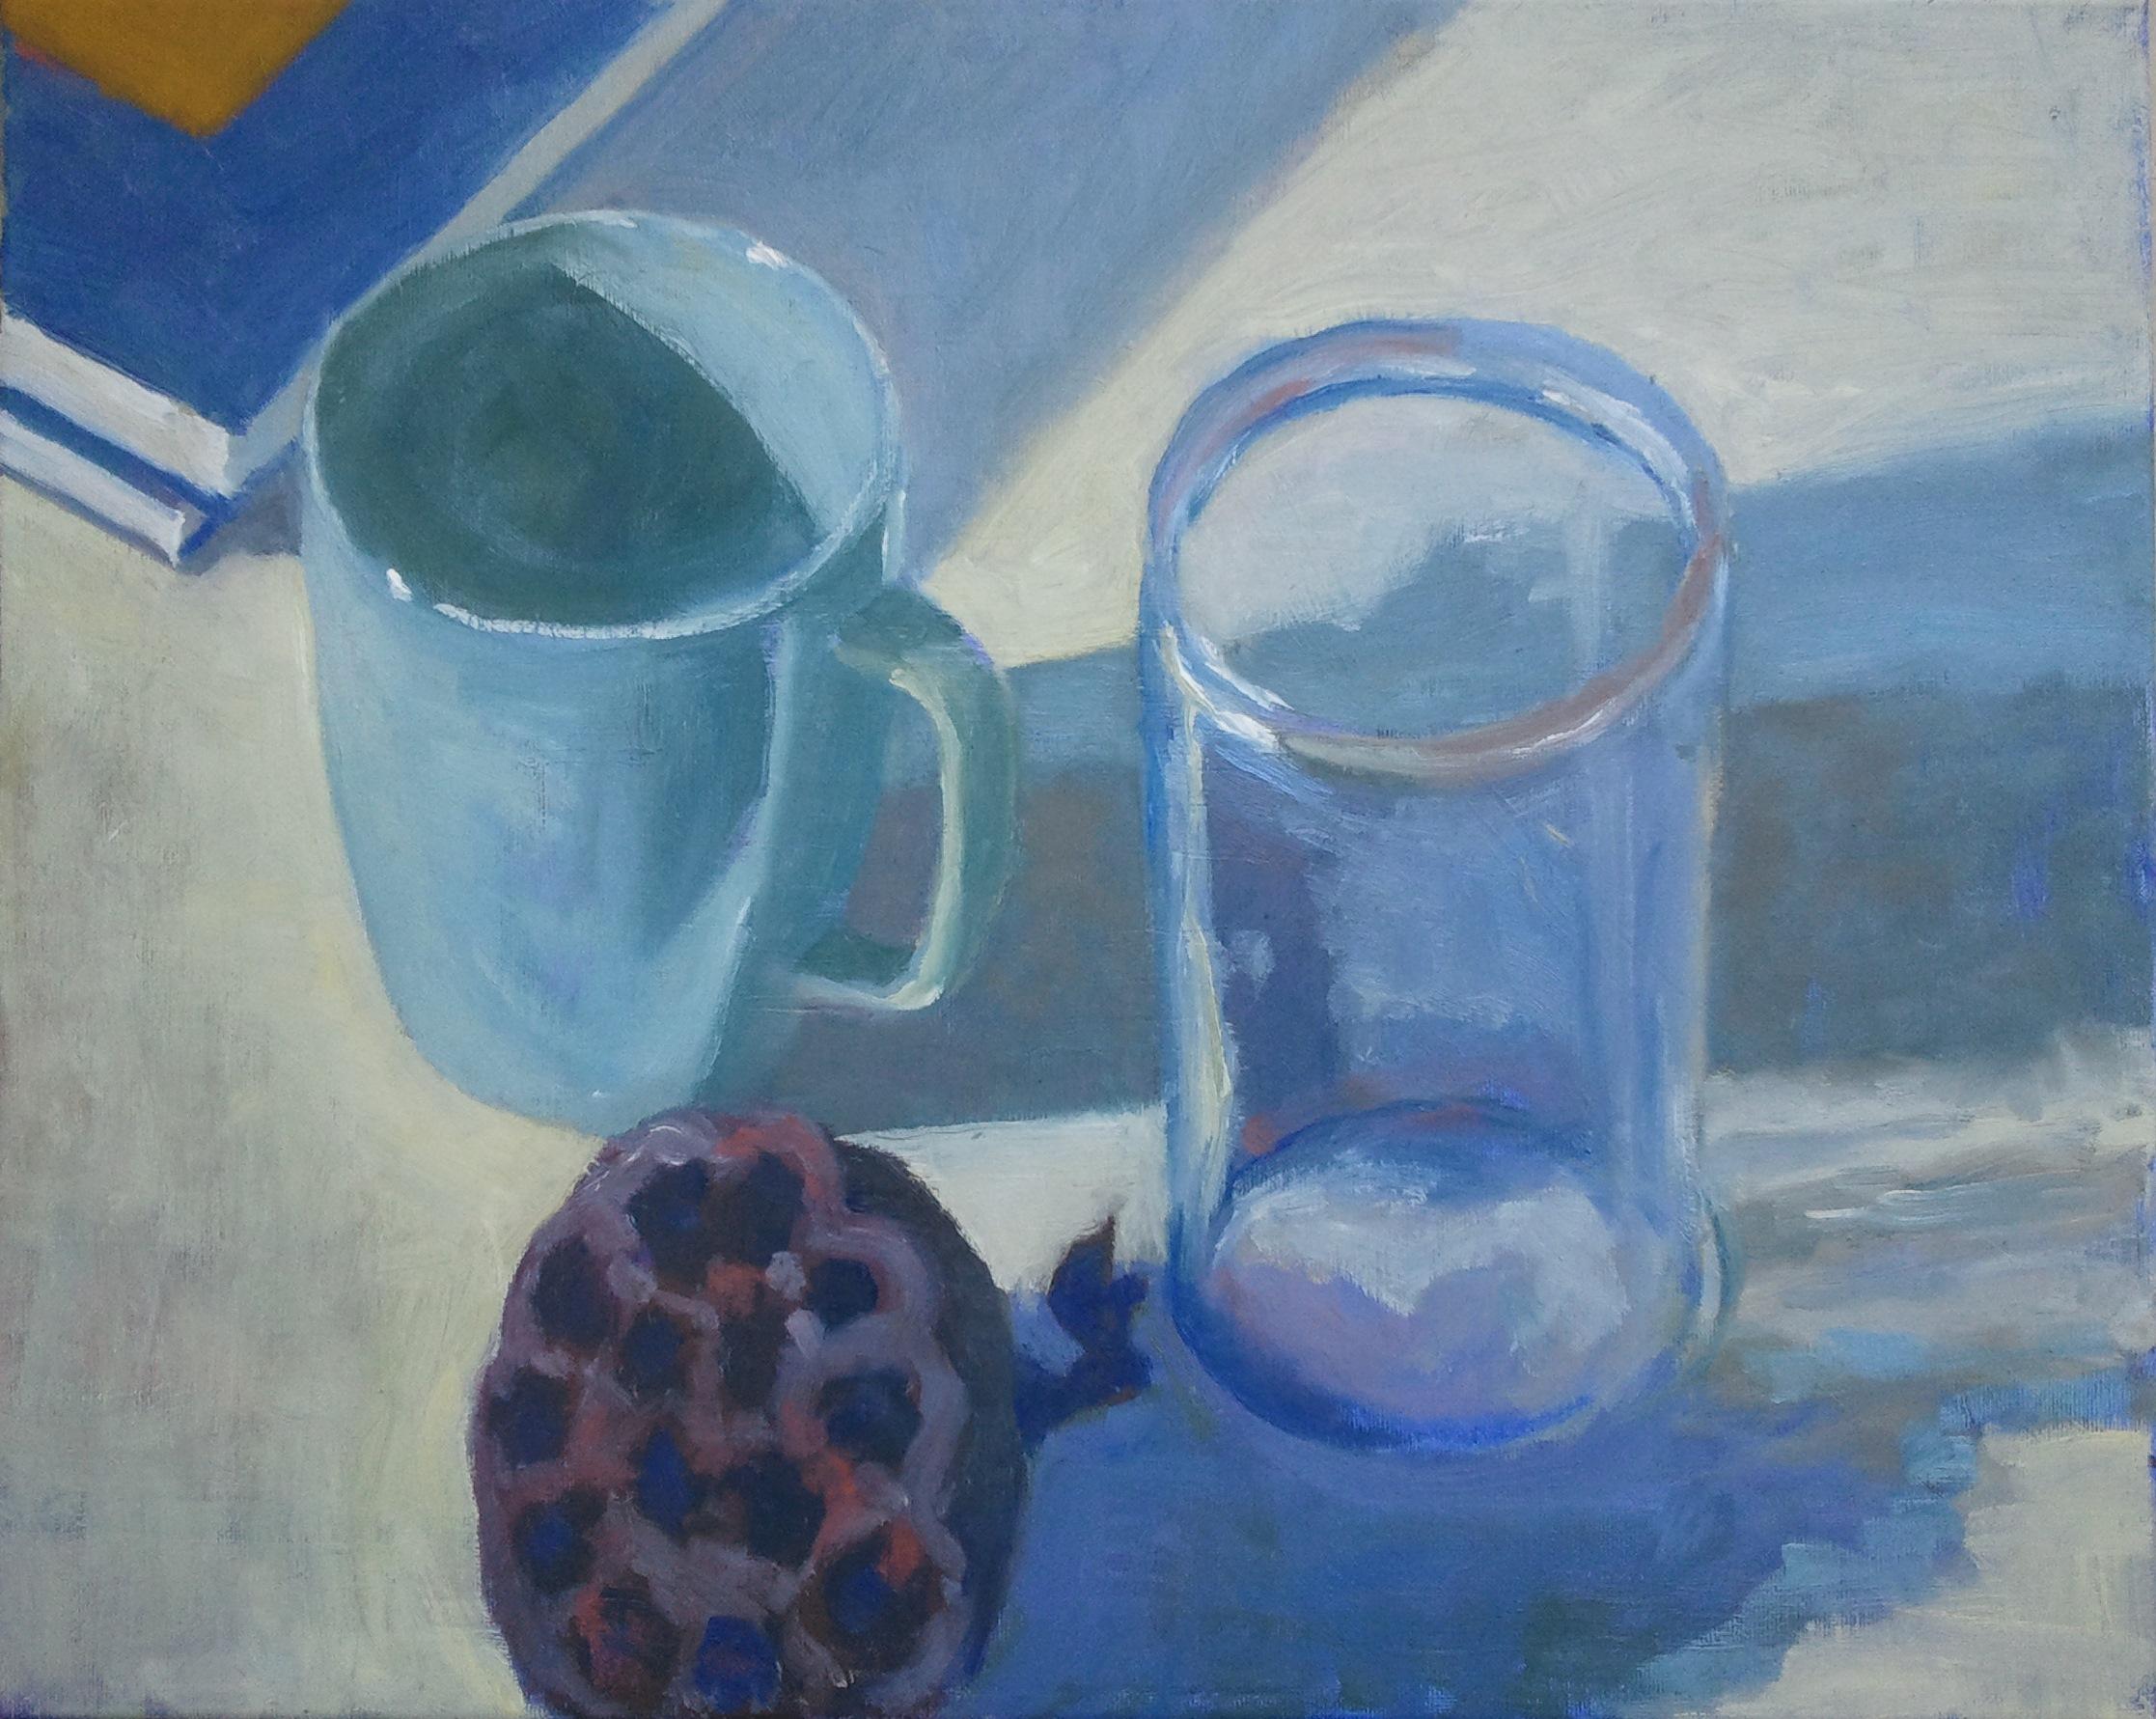 """Still Life with Jar, Mugand Lily Seedpod,""16""x20"", oil on canvas."